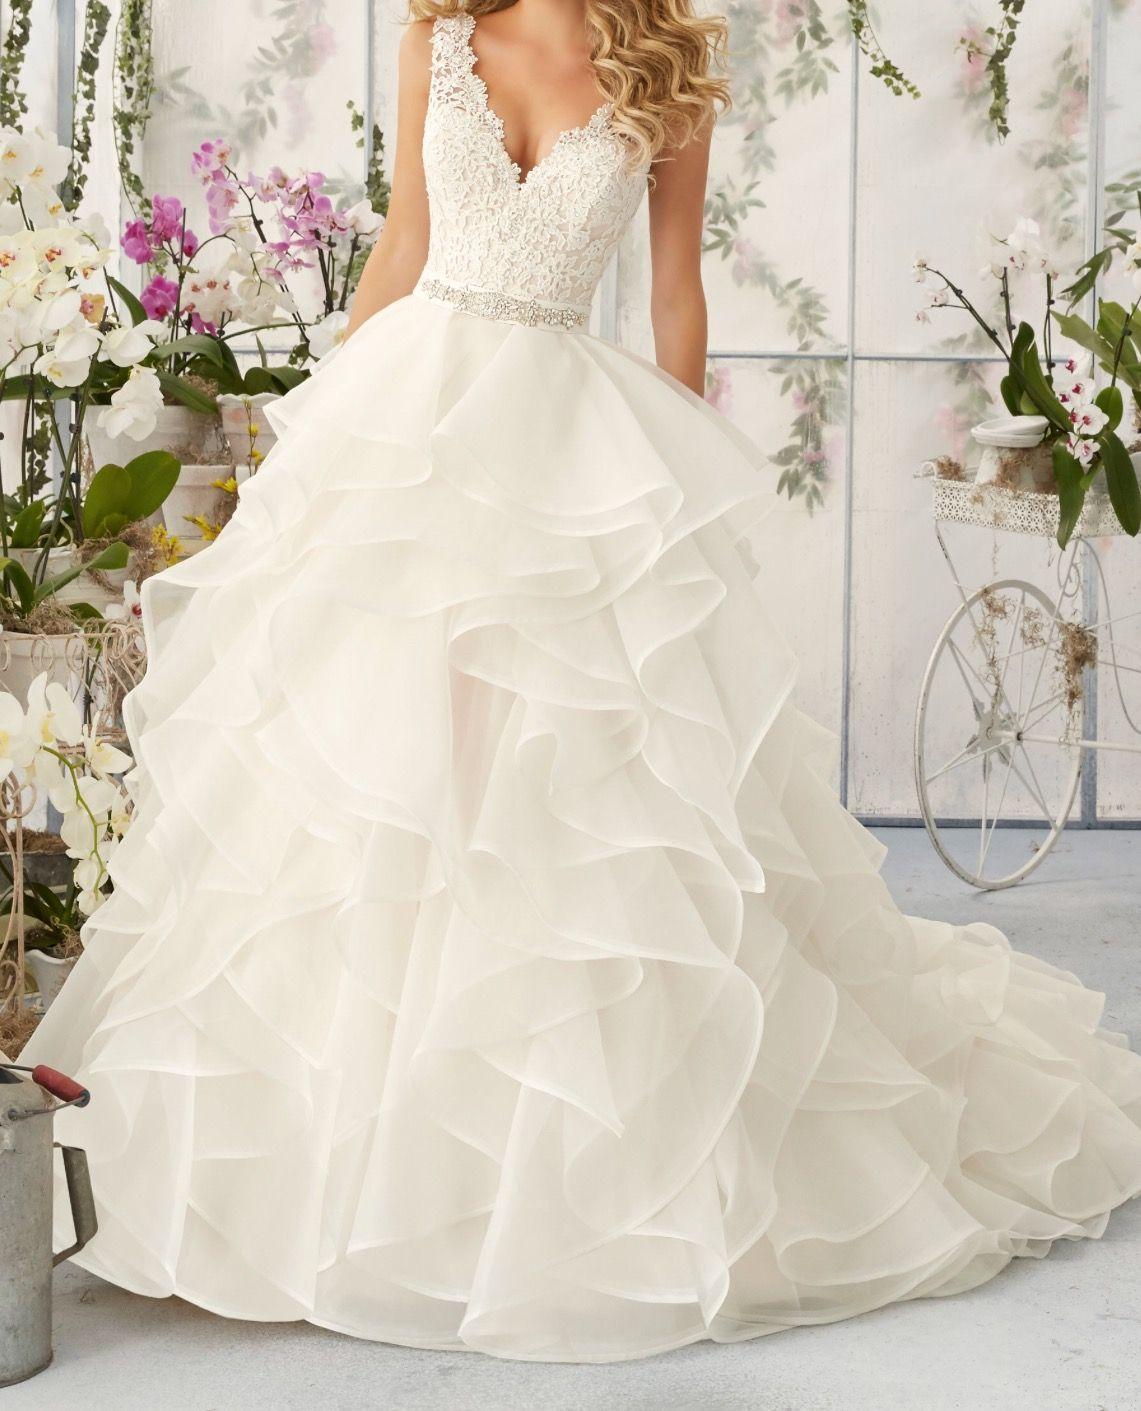 Perdita Wedding Dress Morilee Mori Lee Wedding Dress Wedding Dress Styles Wedding Dresses For Girls